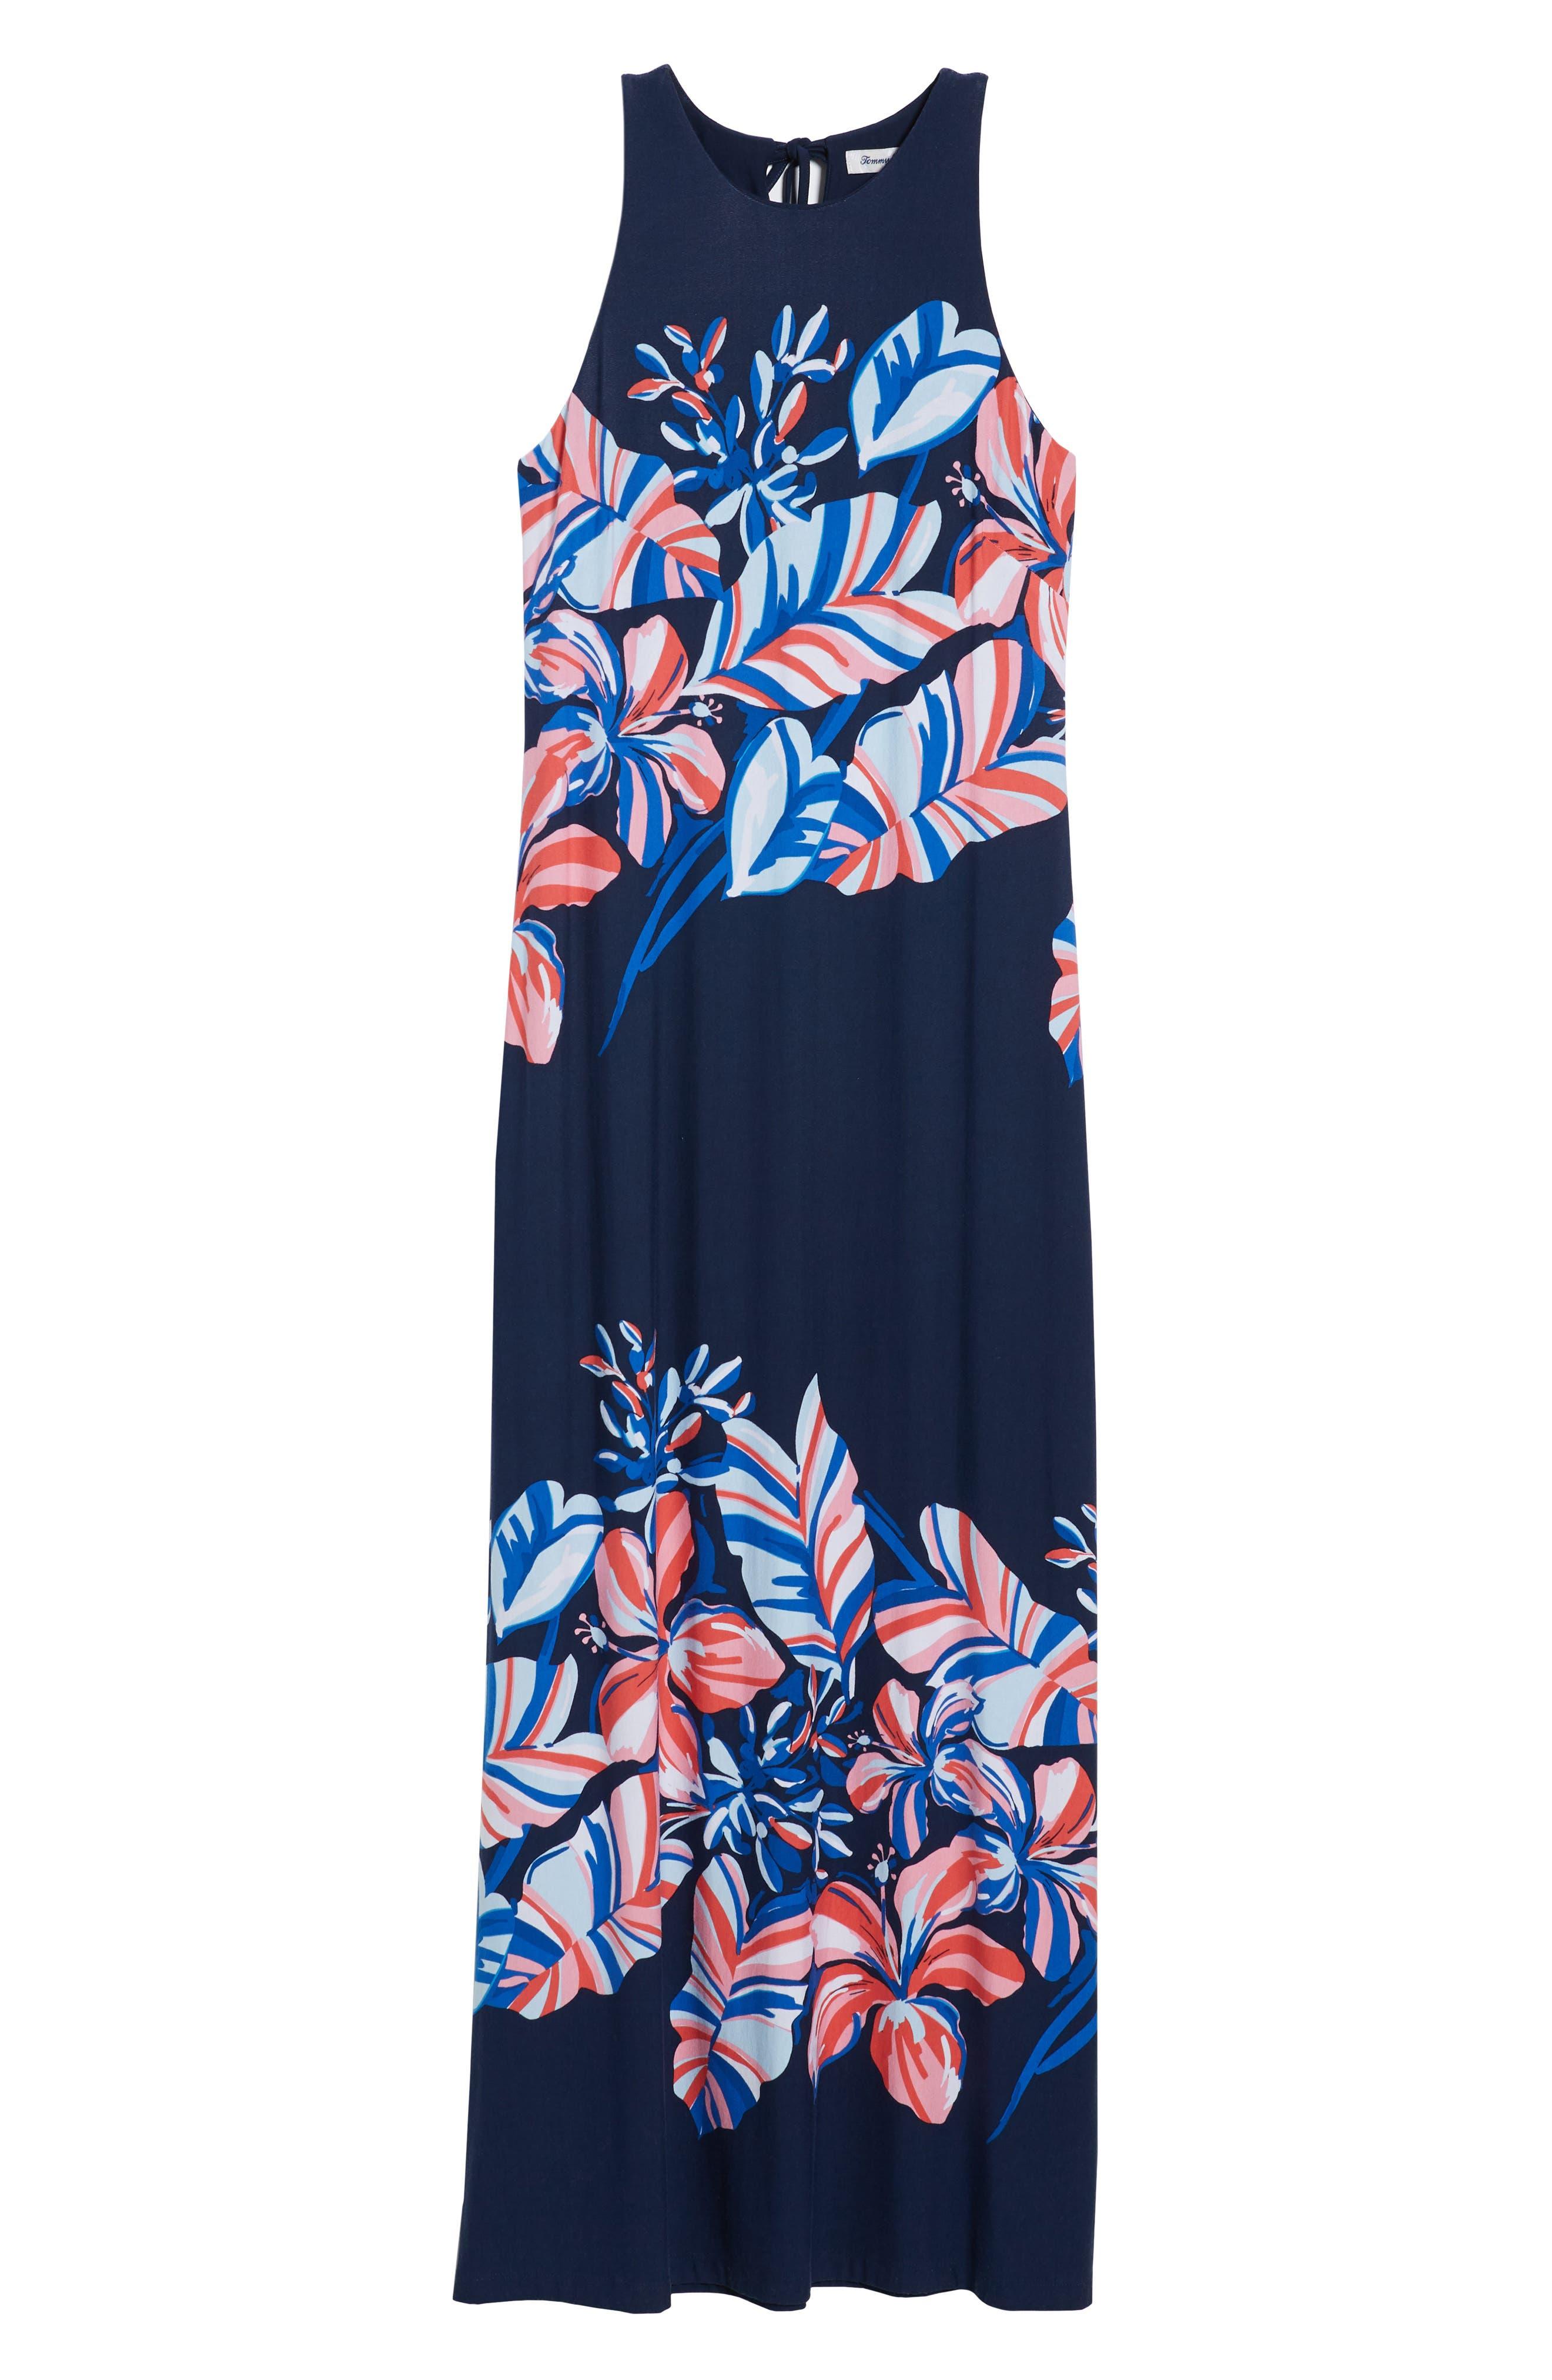 Le Tigre Floral Maxi Dress,                             Alternate thumbnail 7, color,                             Ocean Deep